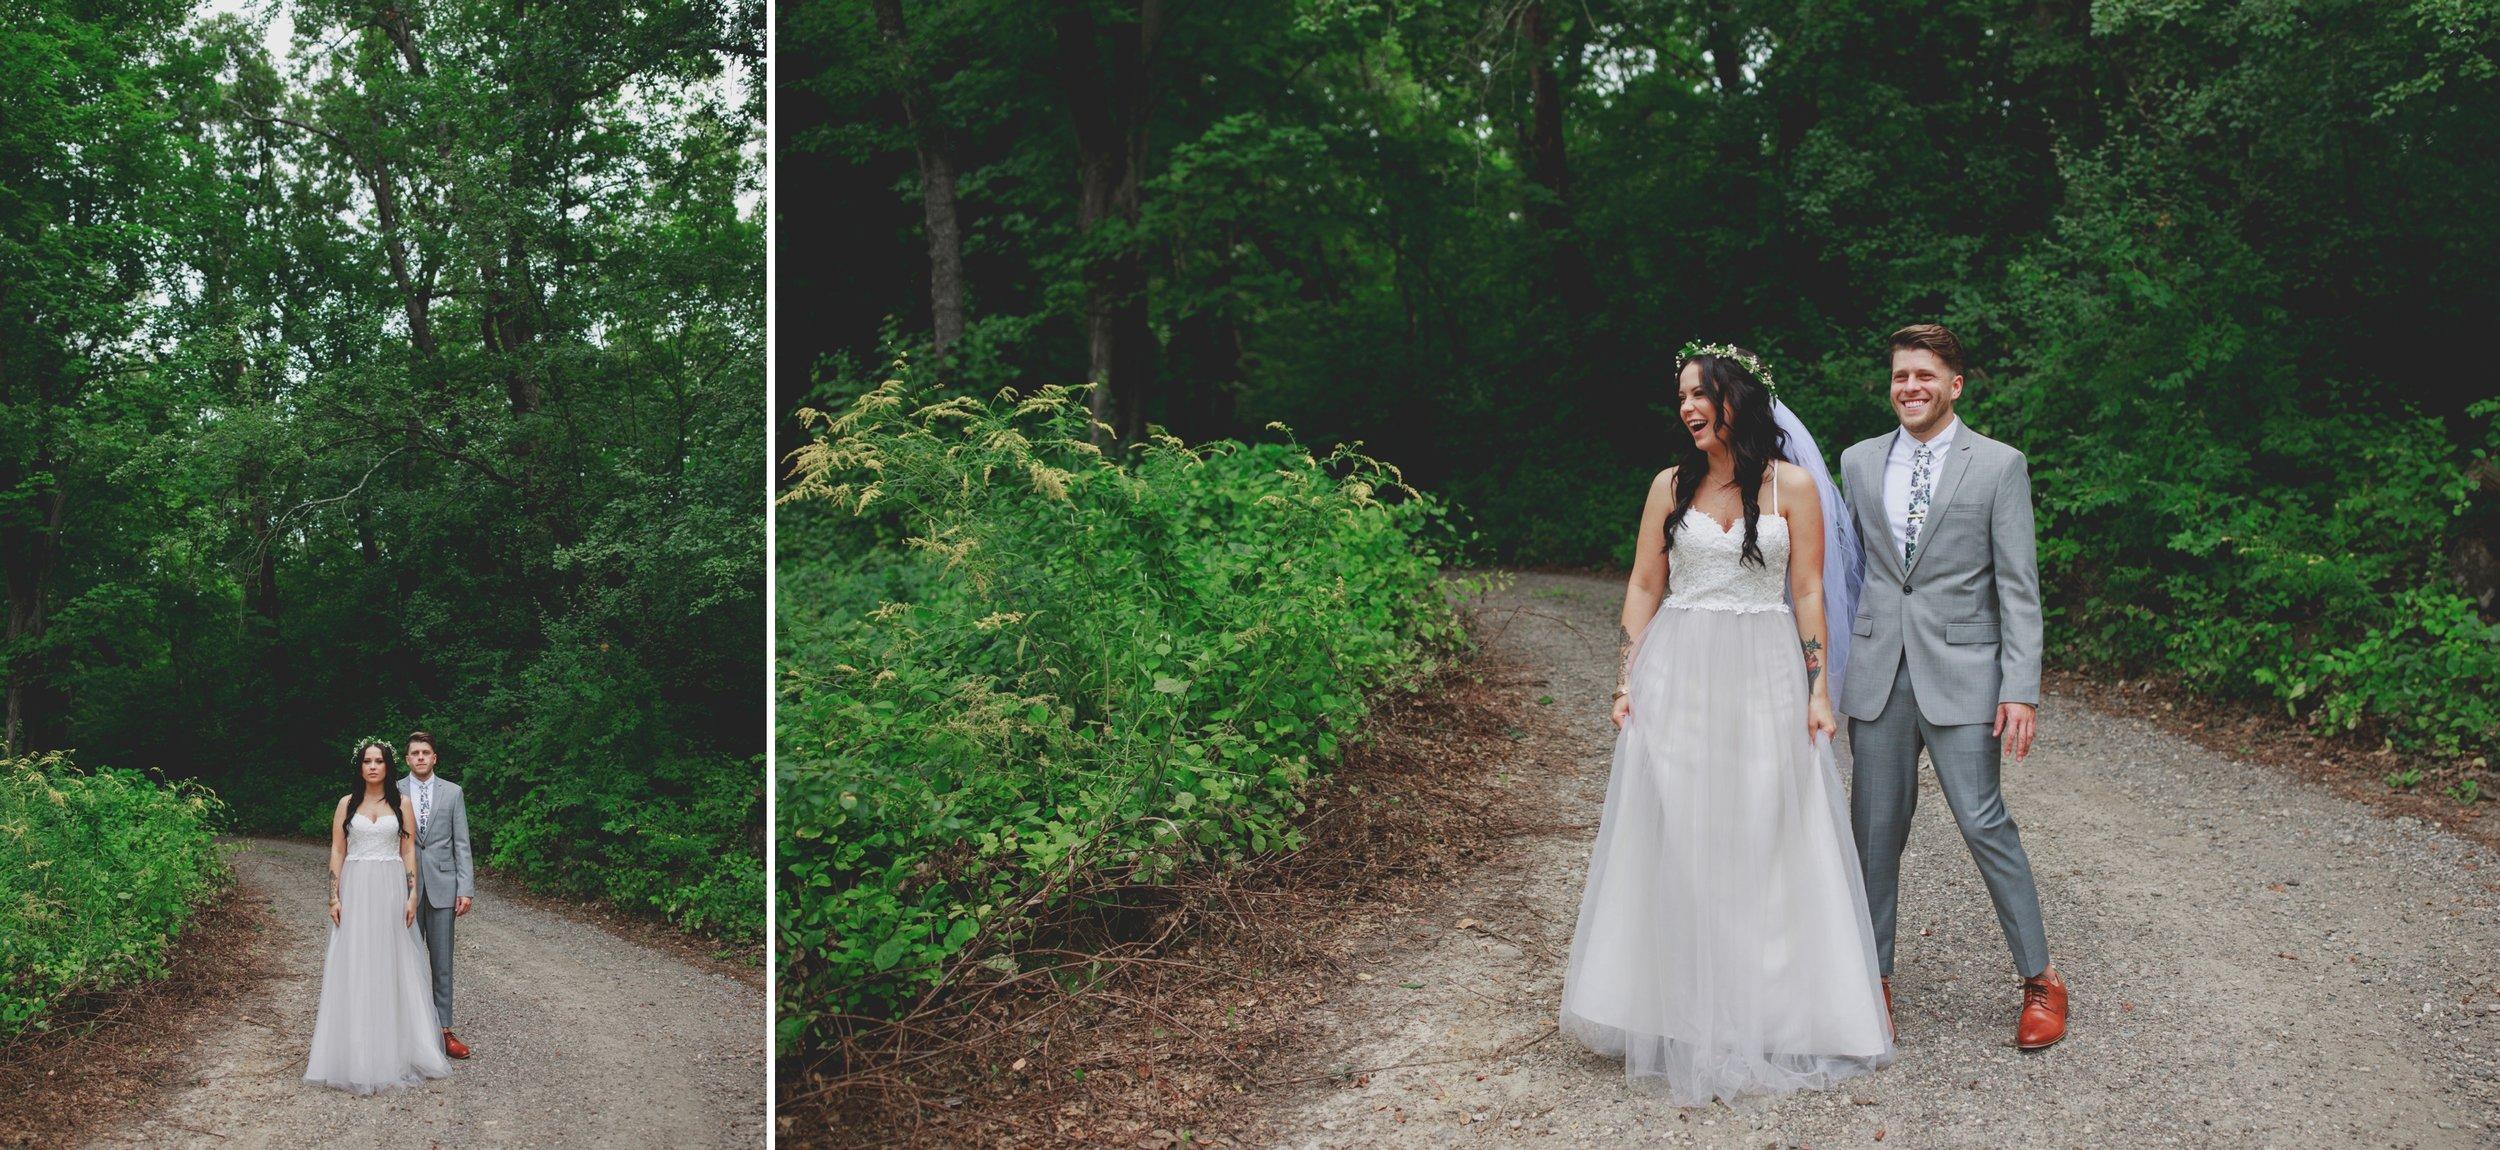 amanda_vanvels_michigan_camp_wedding_034.jpg